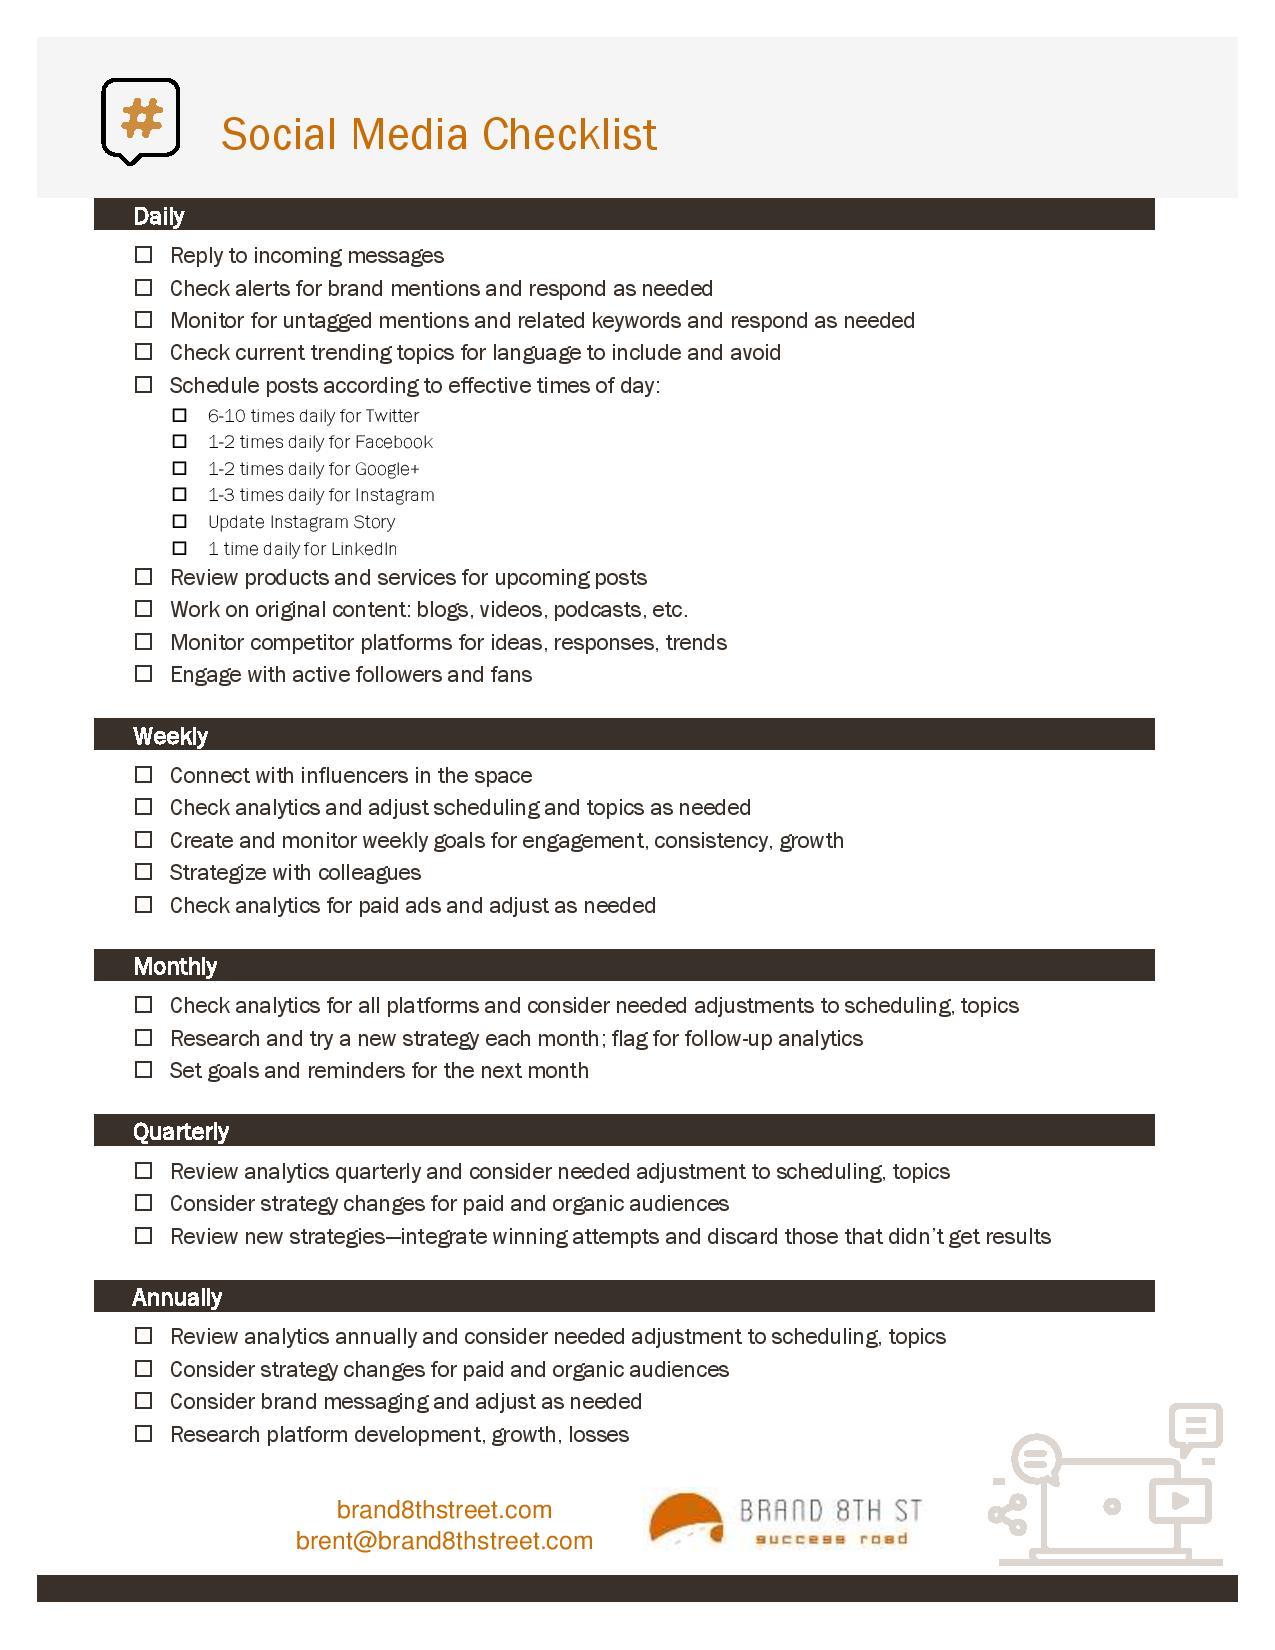 Social Media Checklist - Clients-page-001.jpg